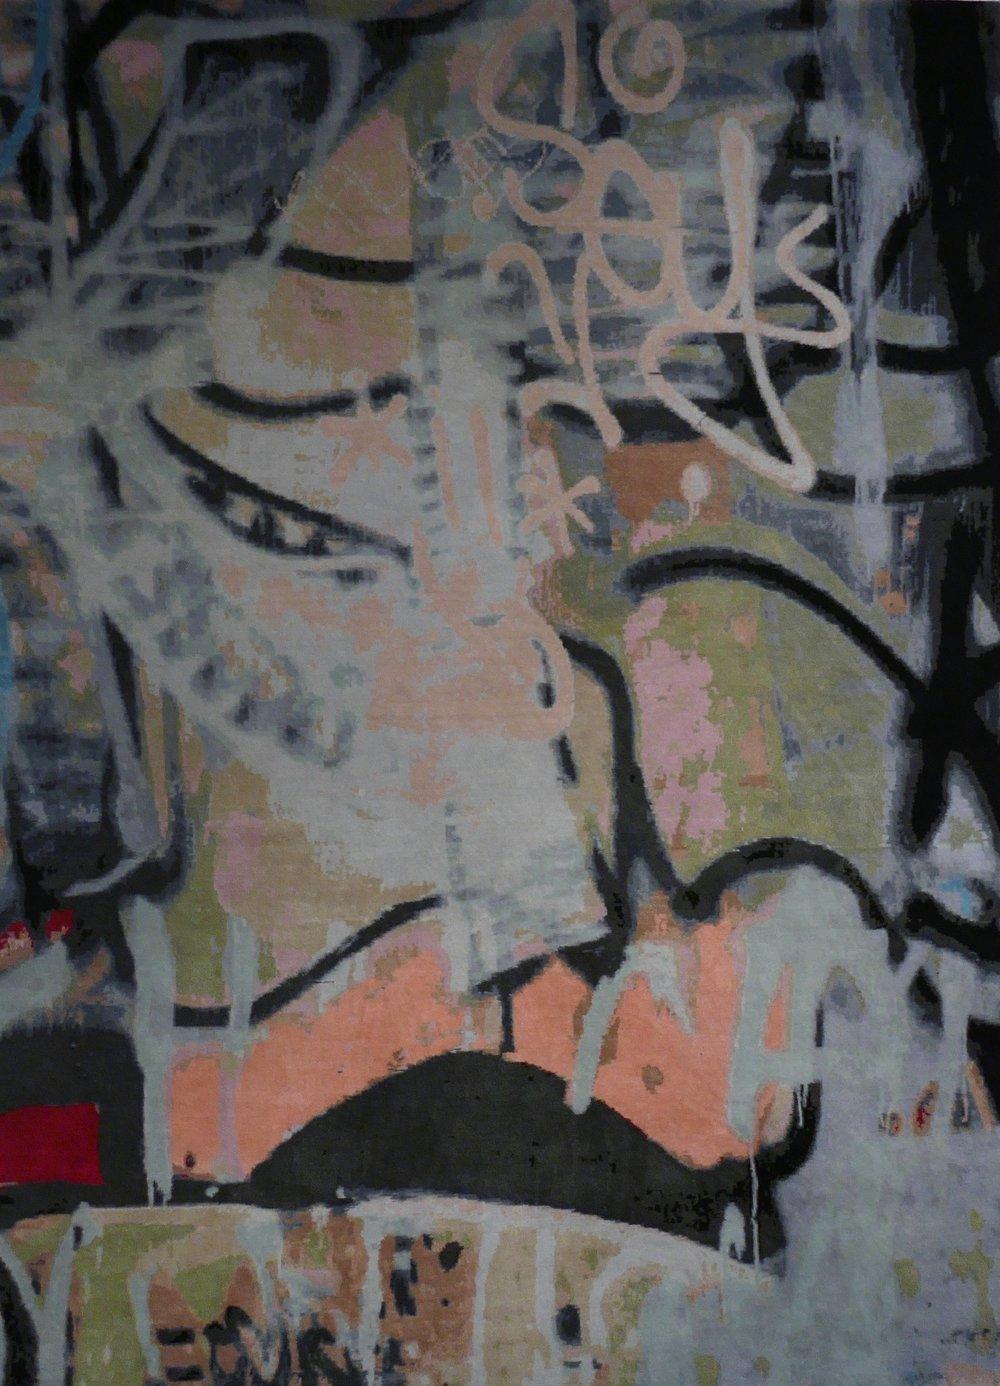 Graffiti, 8'x10'.jpg